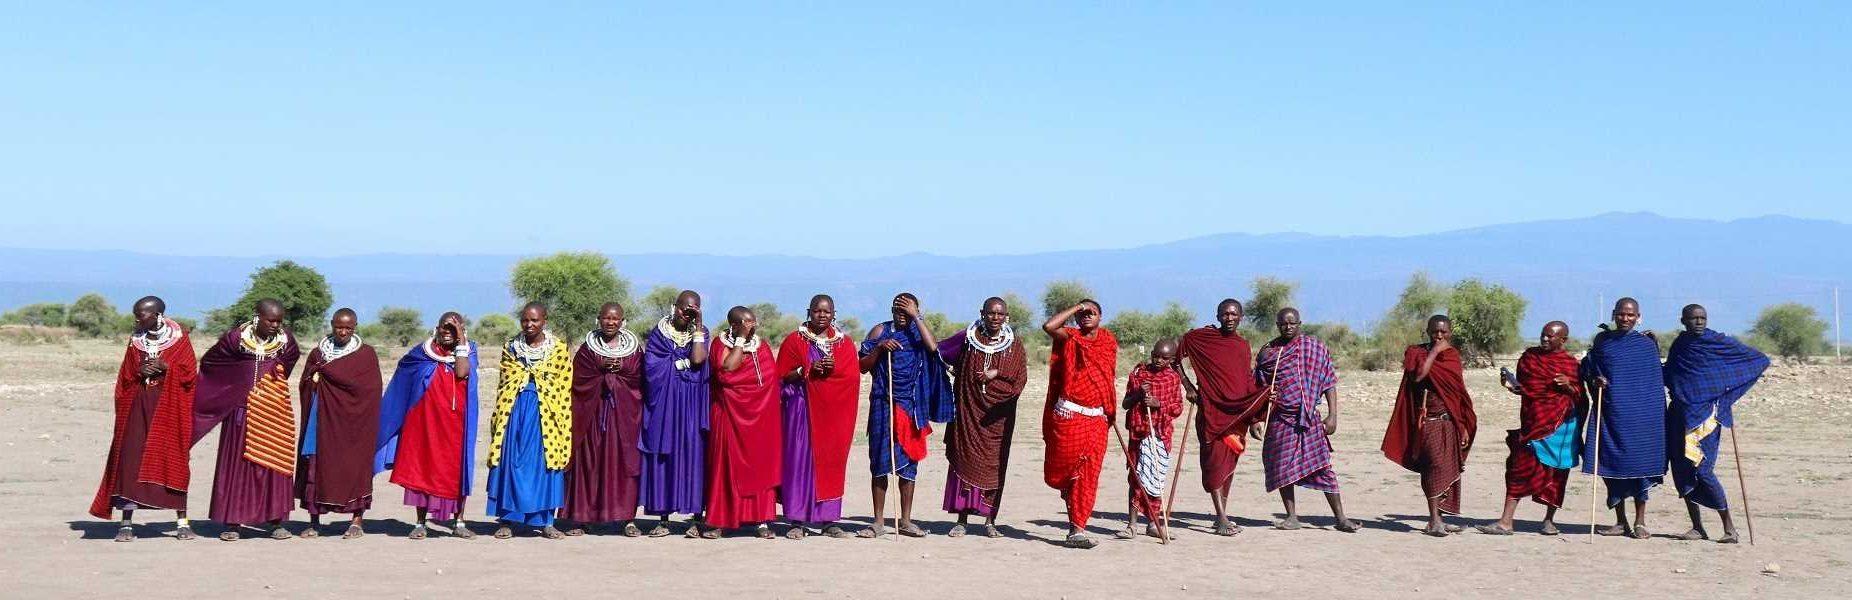 Travex Africa